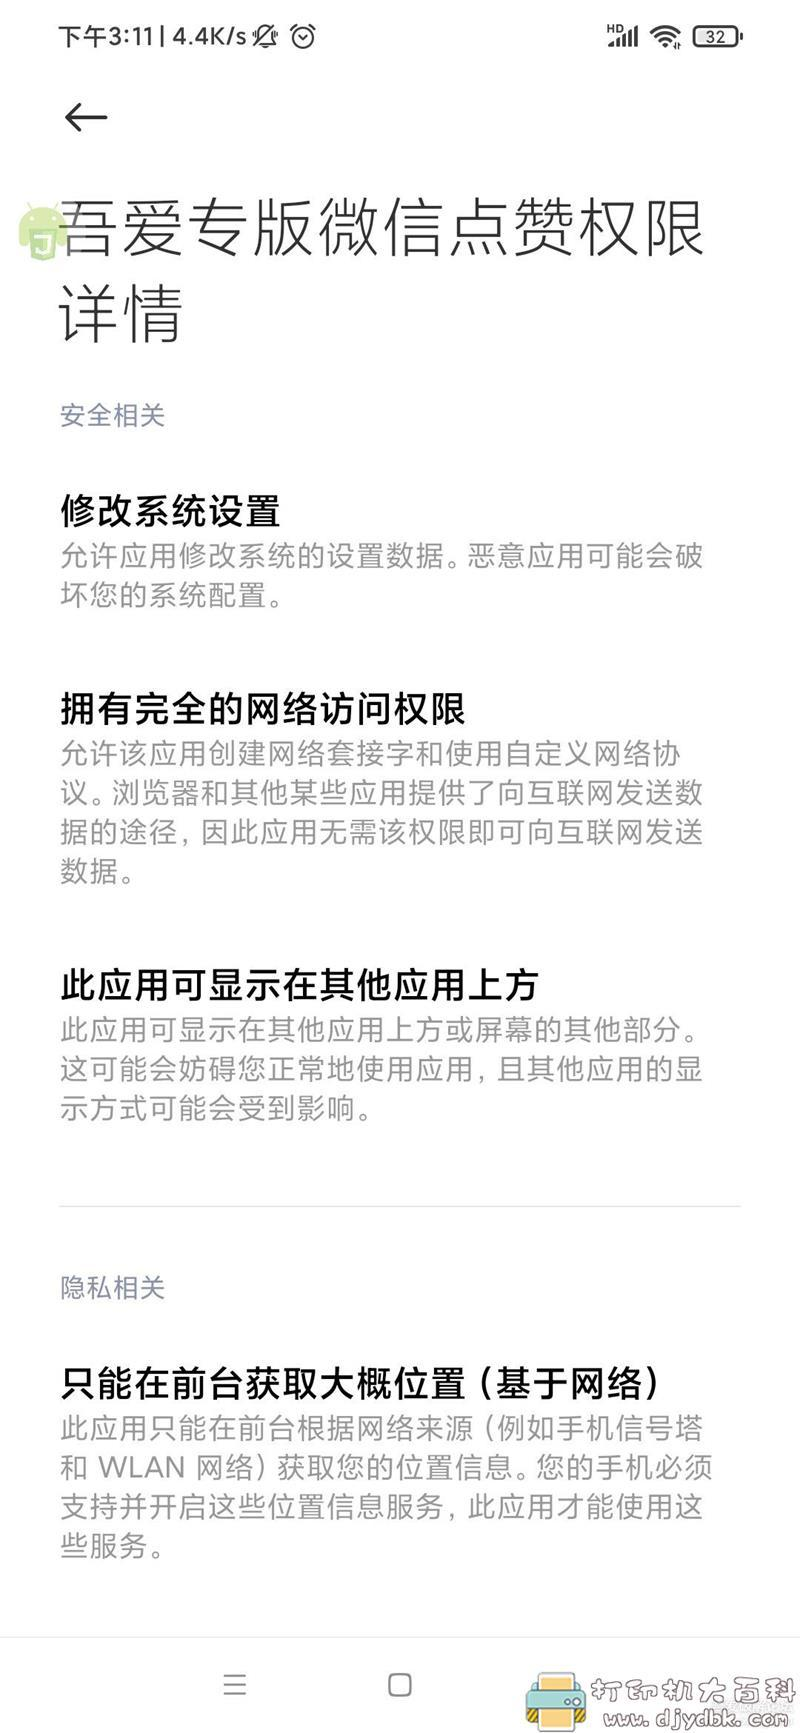 [Android]【Autojs脚本】微信运动点赞和朋友圈点赞 version8.0.2最新版本 配图 No.2